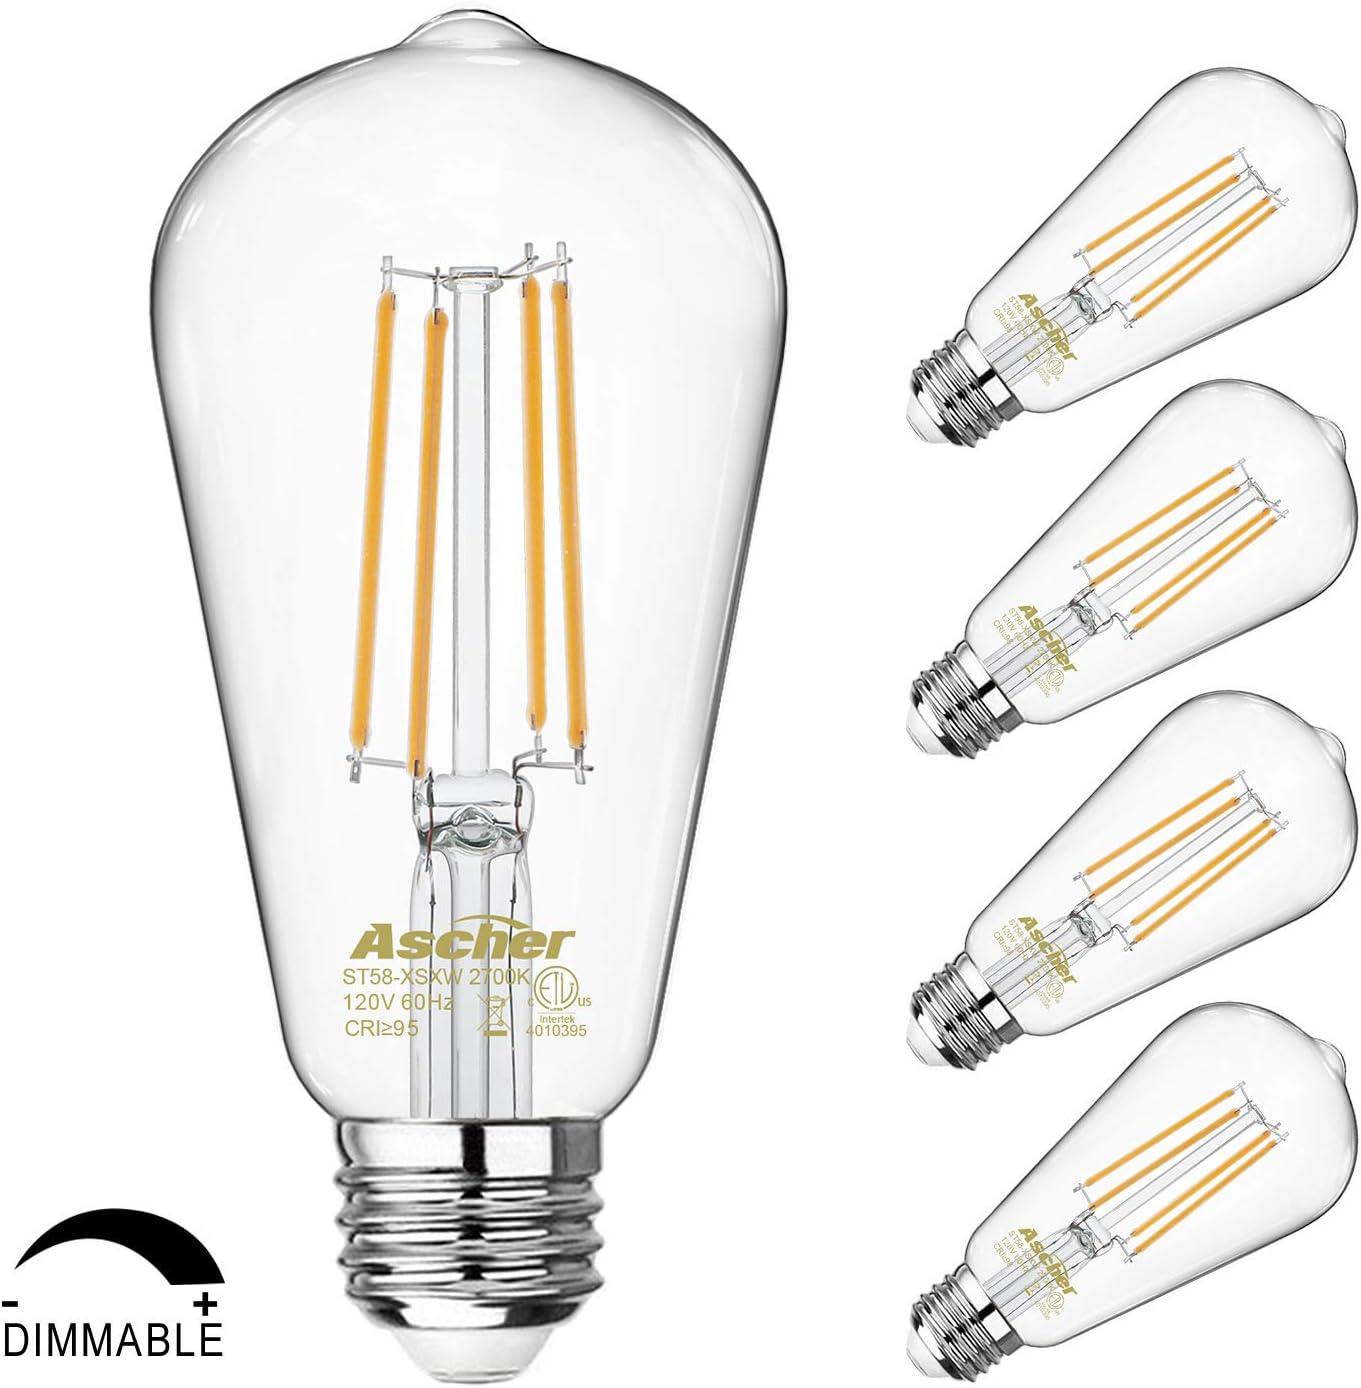 Dimmable Vintage LED Edison Bulbs 60 Watt Equivalent, Eye Protection Led Bulb with 95+ CRI, Warm White 2700K, ST58 Antique LED Filament Bulbs, E26 Medium Base, Pack of 4